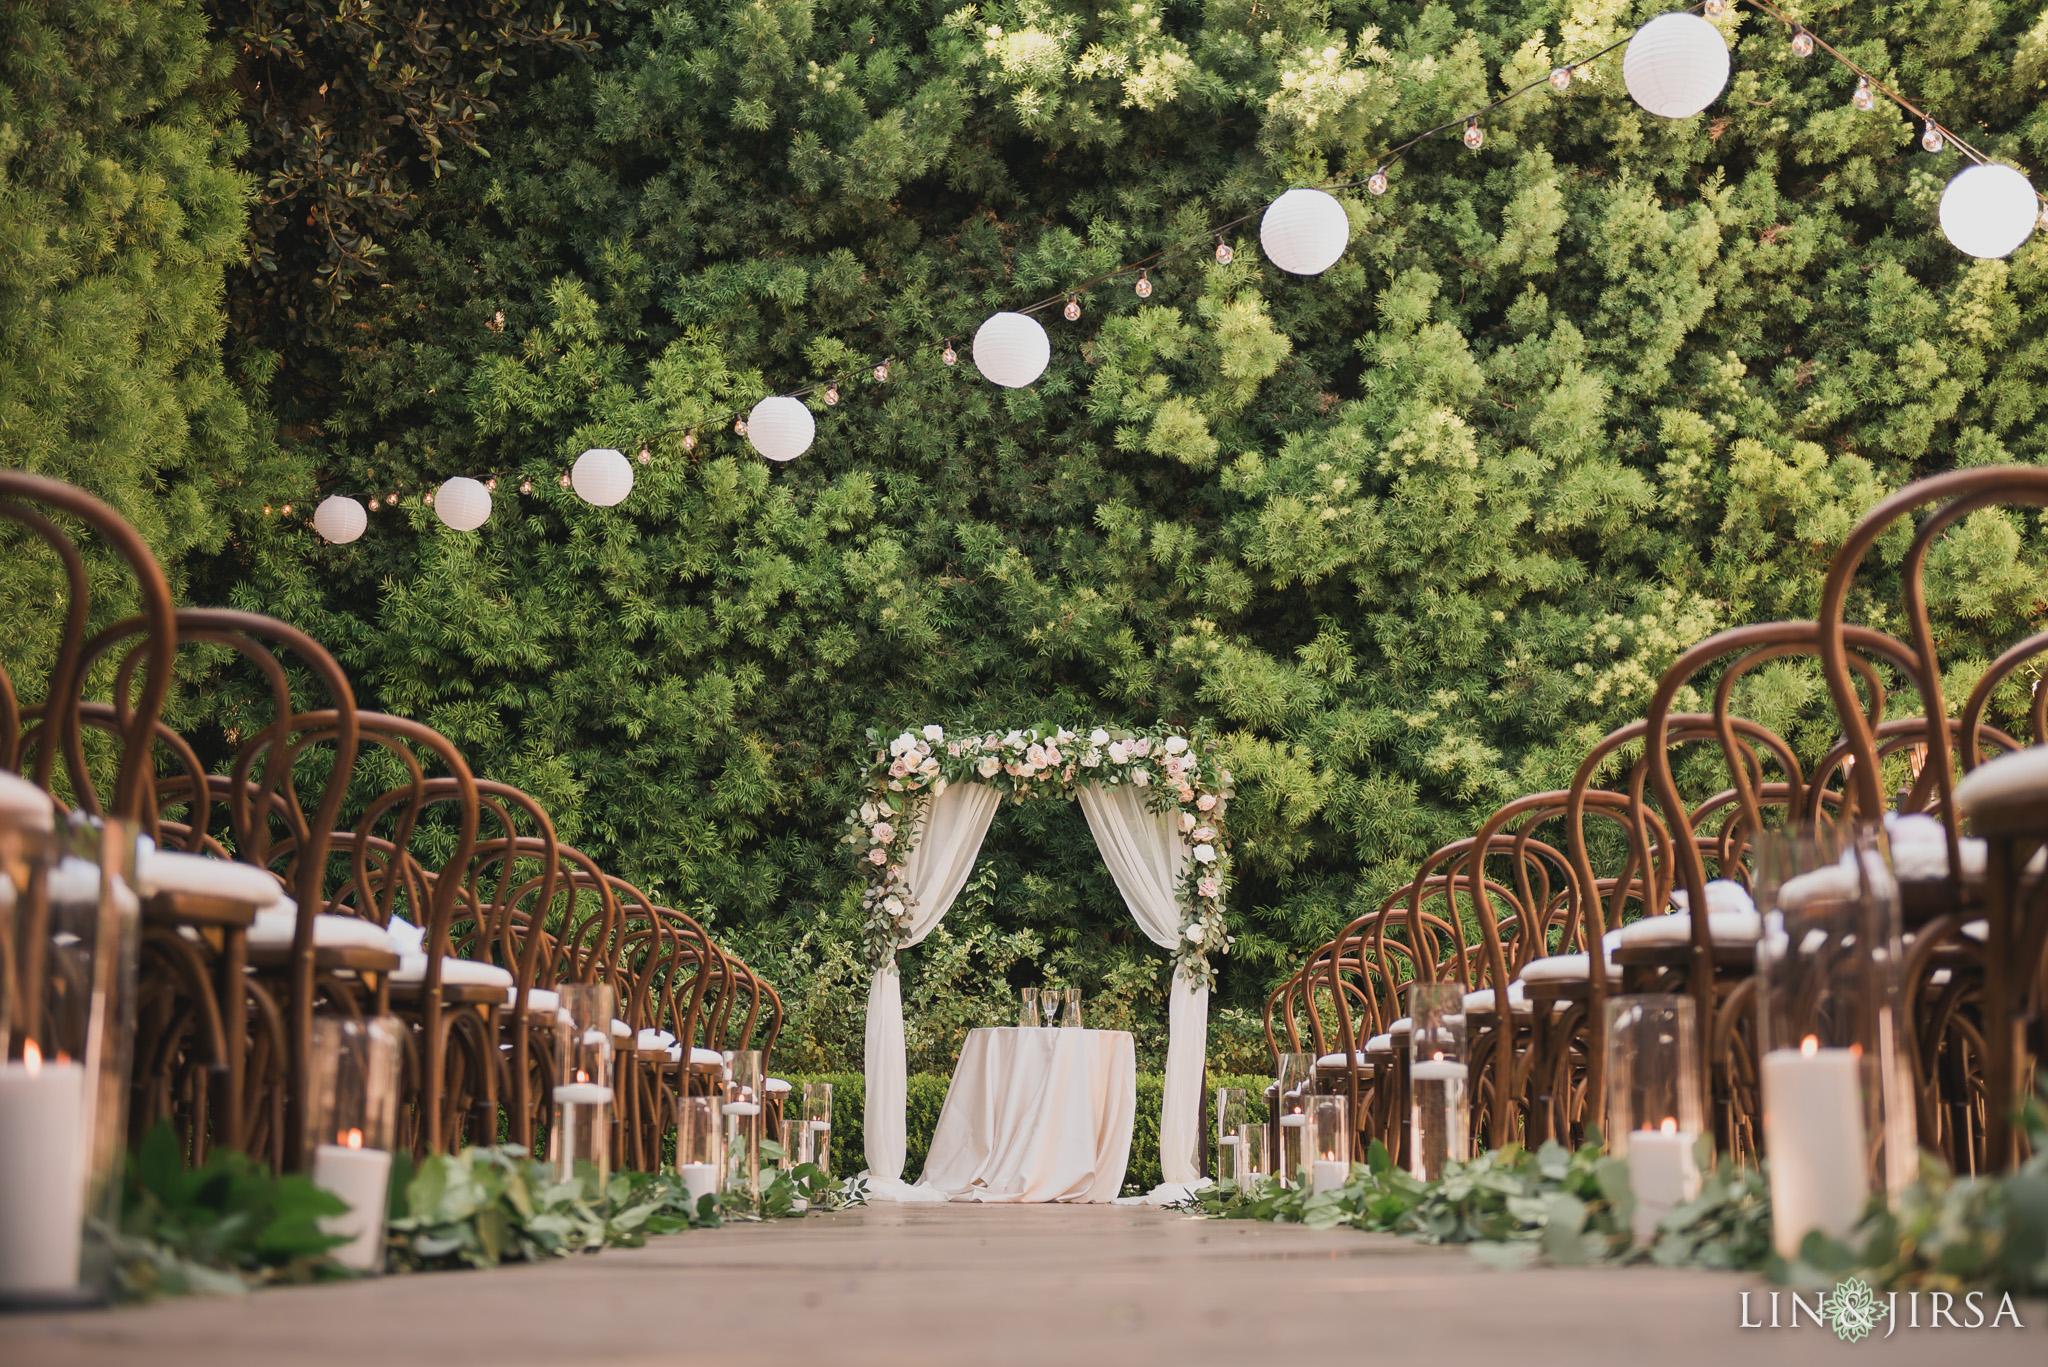 Franciscan gardens san juan capistrano wedding mimi joseph - Franciscan gardens san juan capistrano ...